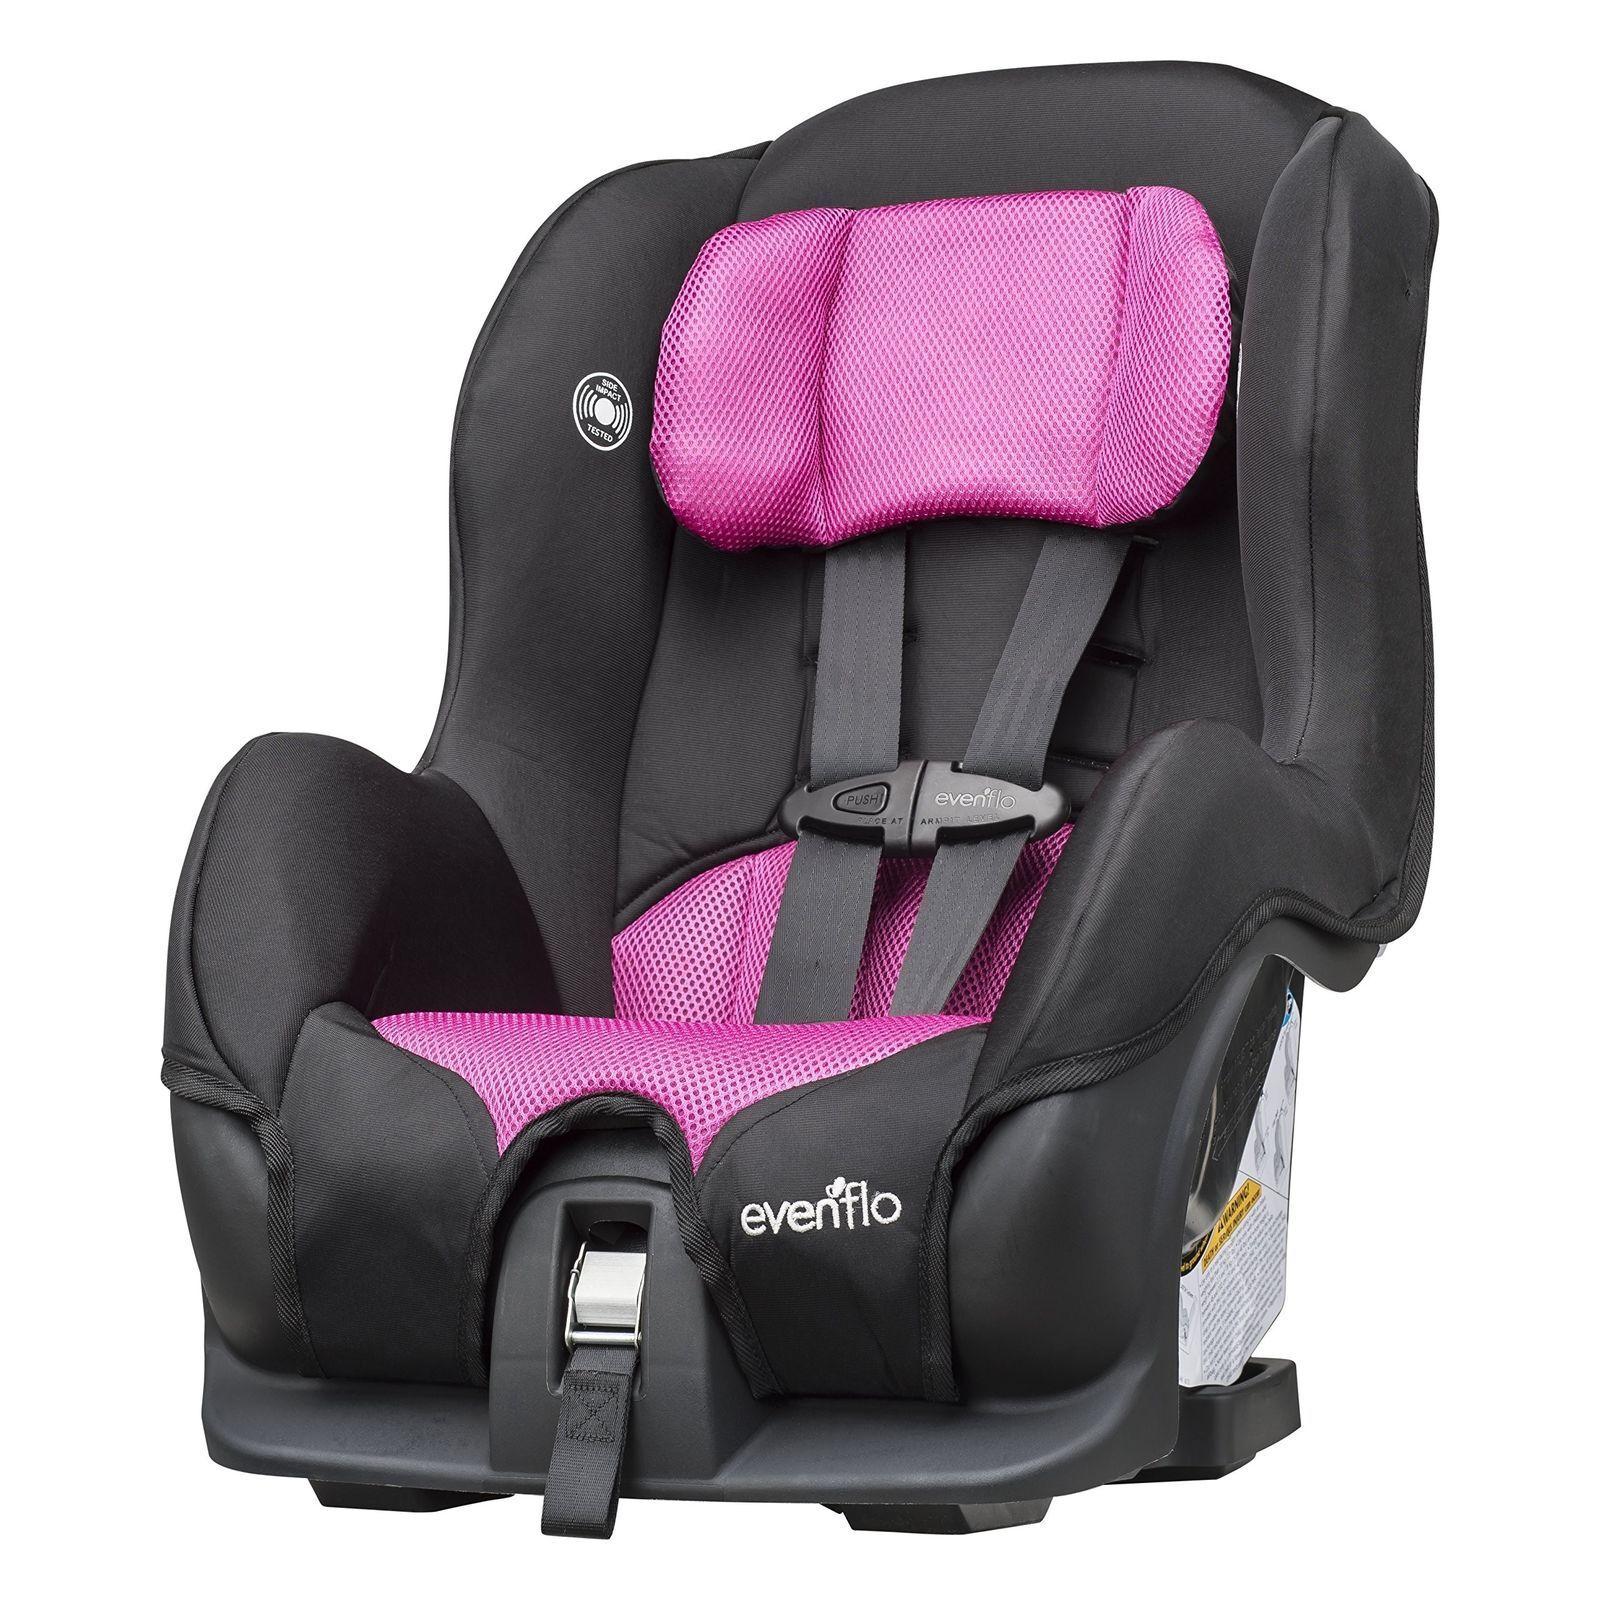 Evenflo Tribute LX Convertible Car Seat, Abigail